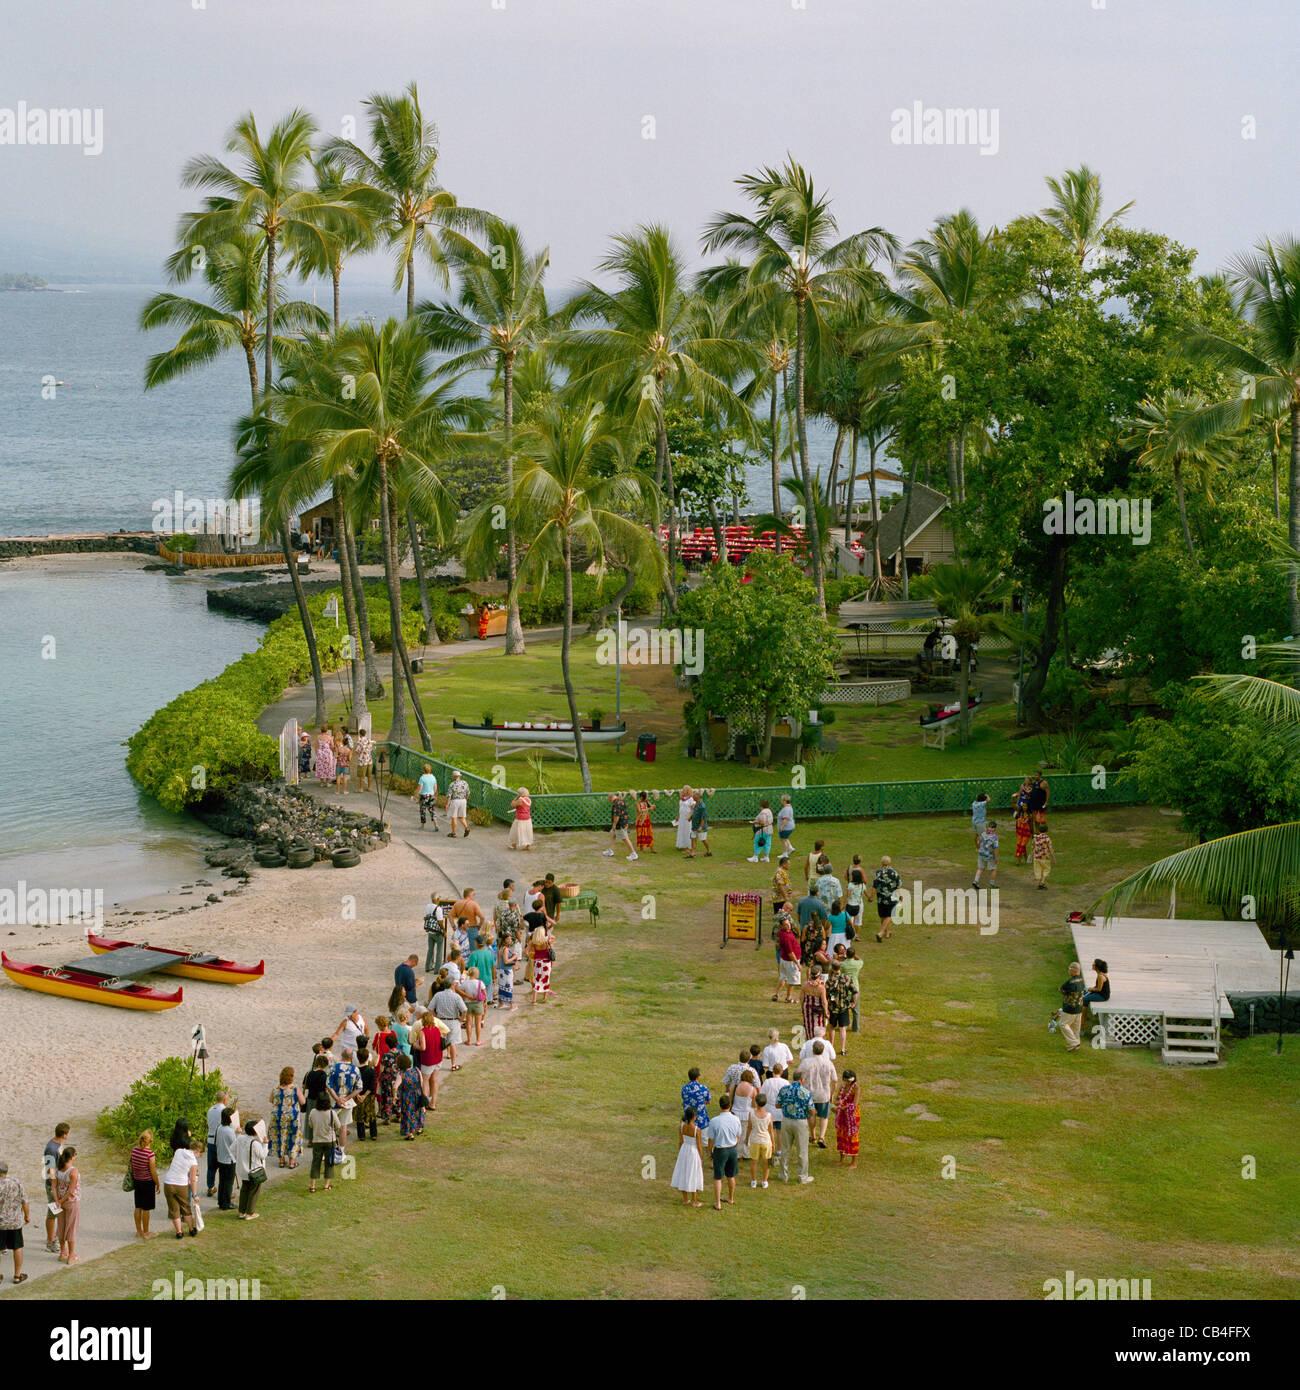 Luau guests queueing at Kamakahonu Beach Kailua-Kona Big Island Hawaii - Stock Image